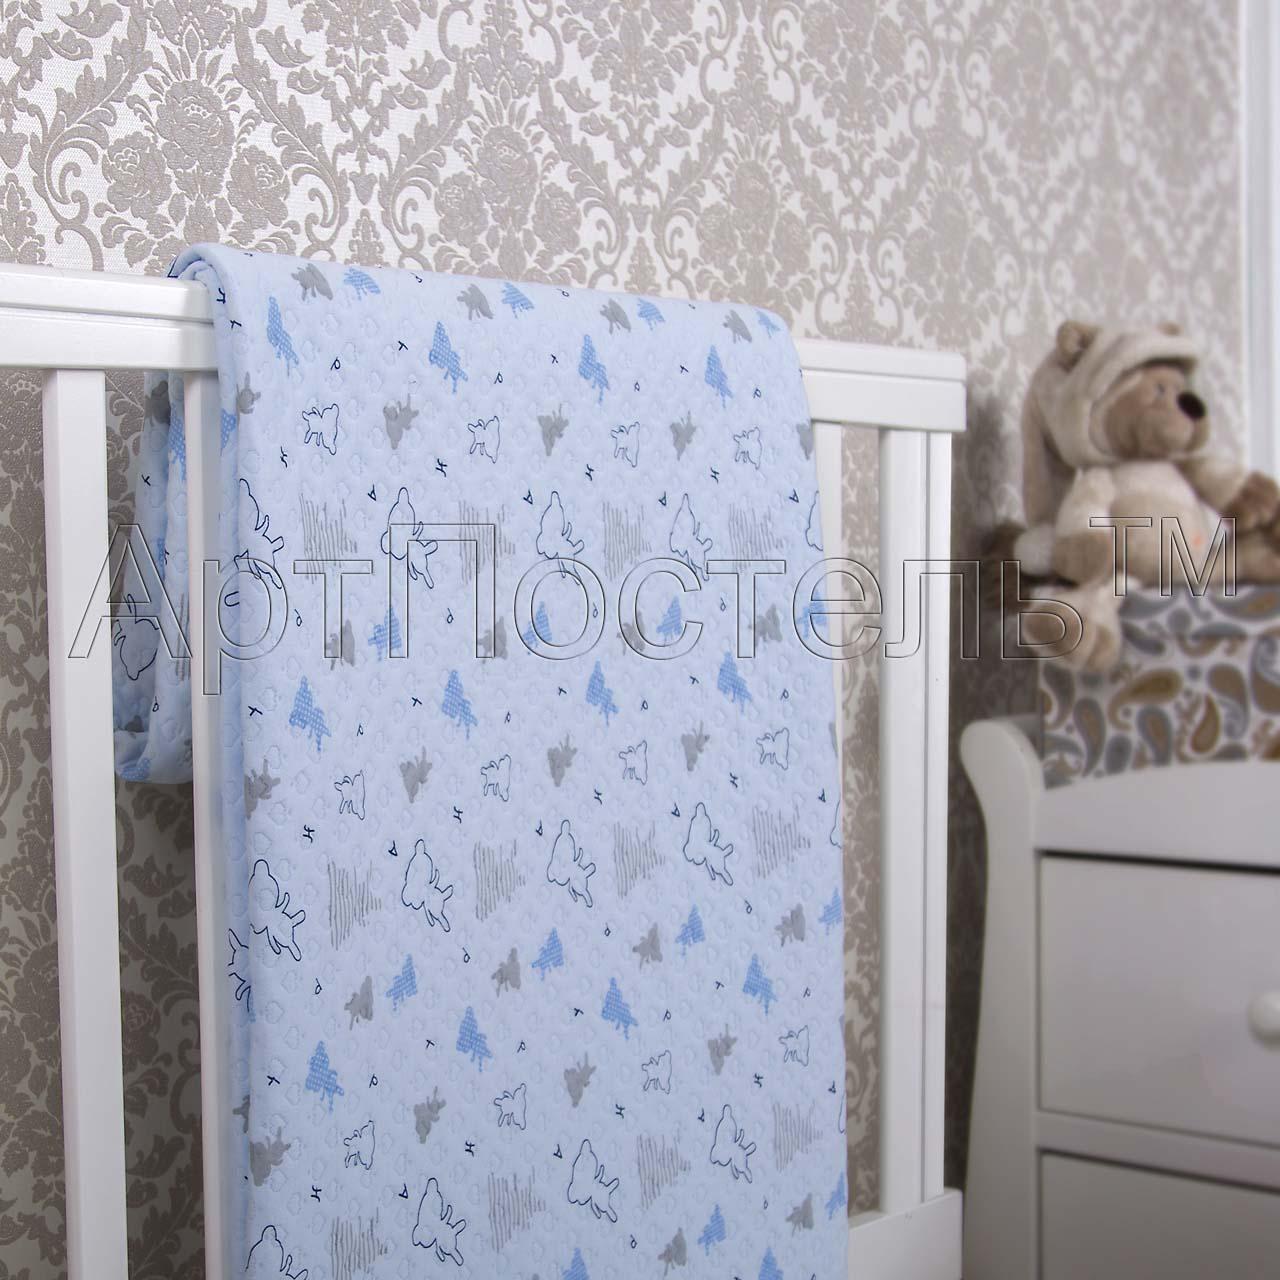 Покрывало  Мишки-малышки  Голубой р. 140х200 - Текстиль для дома артикул: 33961